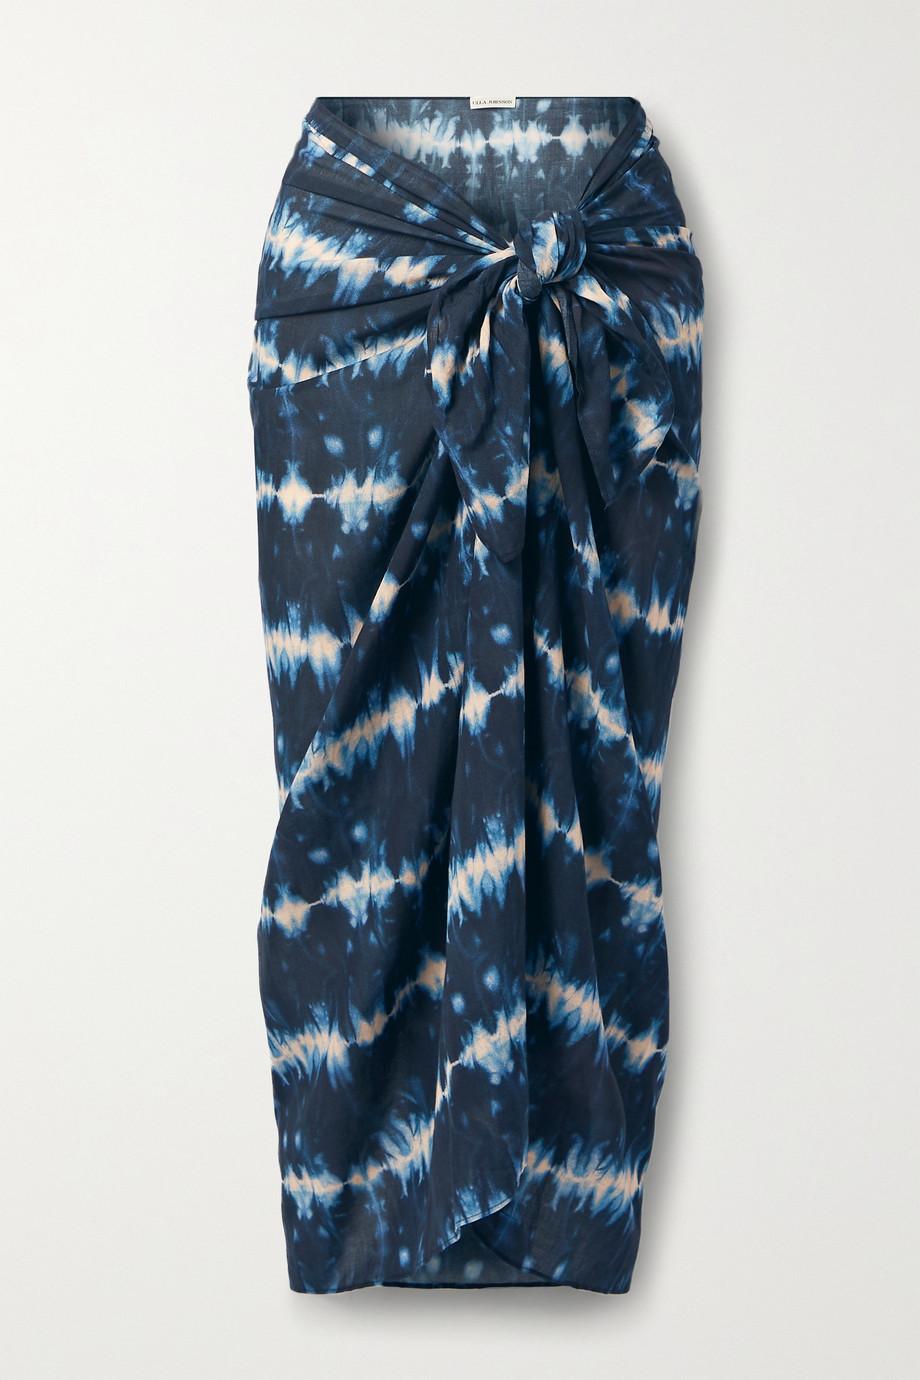 Ulla Johnson Paz tie-dyed cotton-blend voile pareo